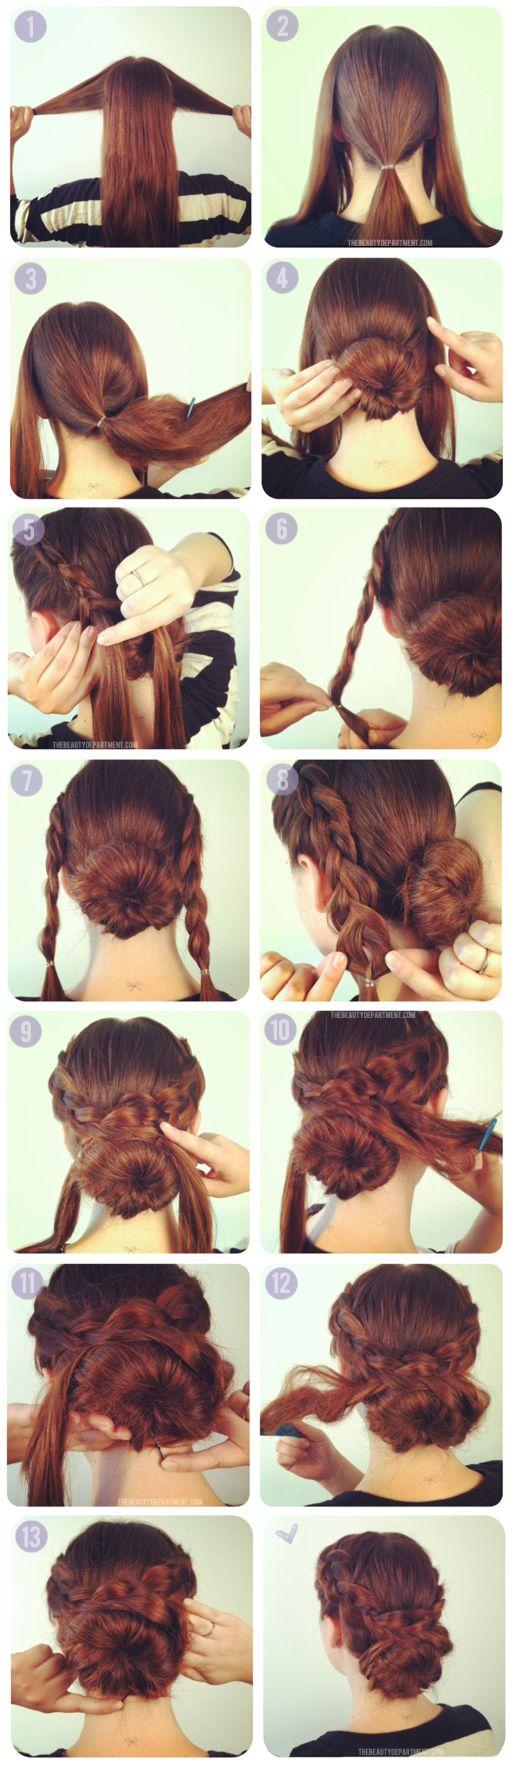 The double braid bun